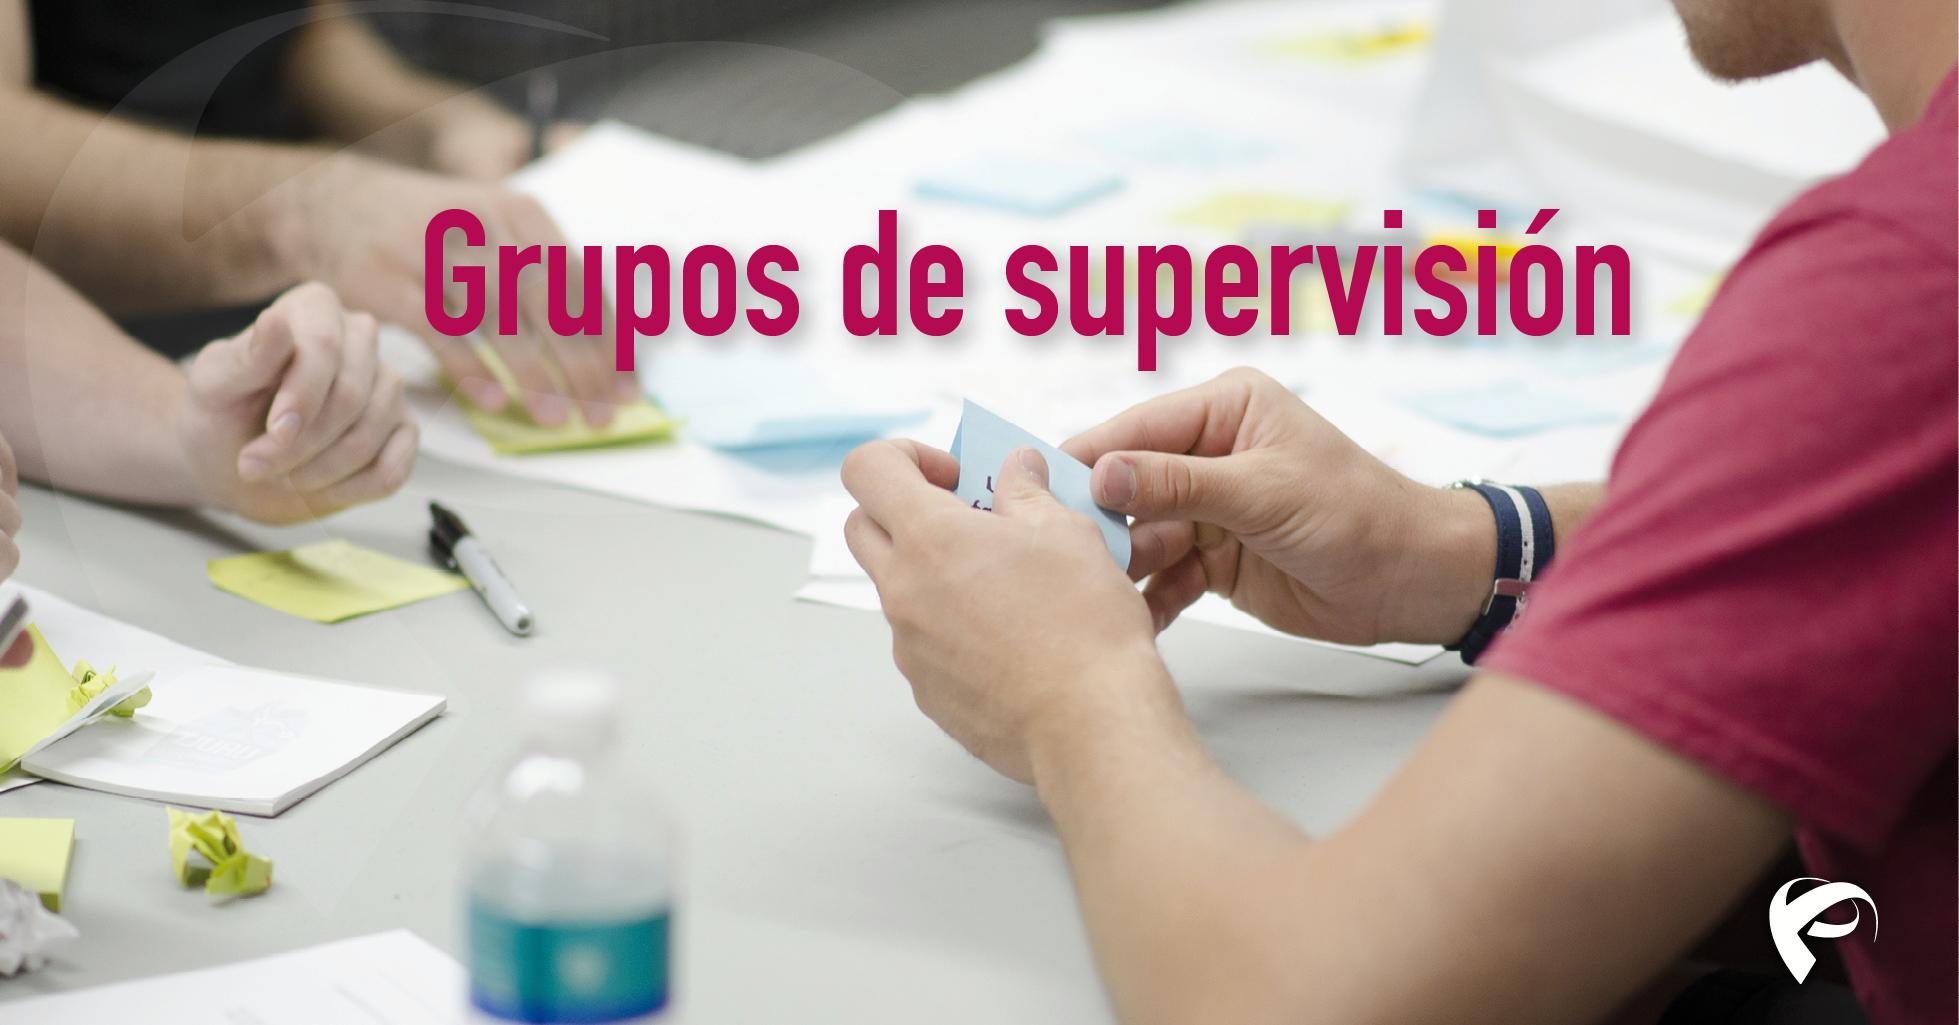 FB_GRUPOS DE SUPERVISION_470X246_1